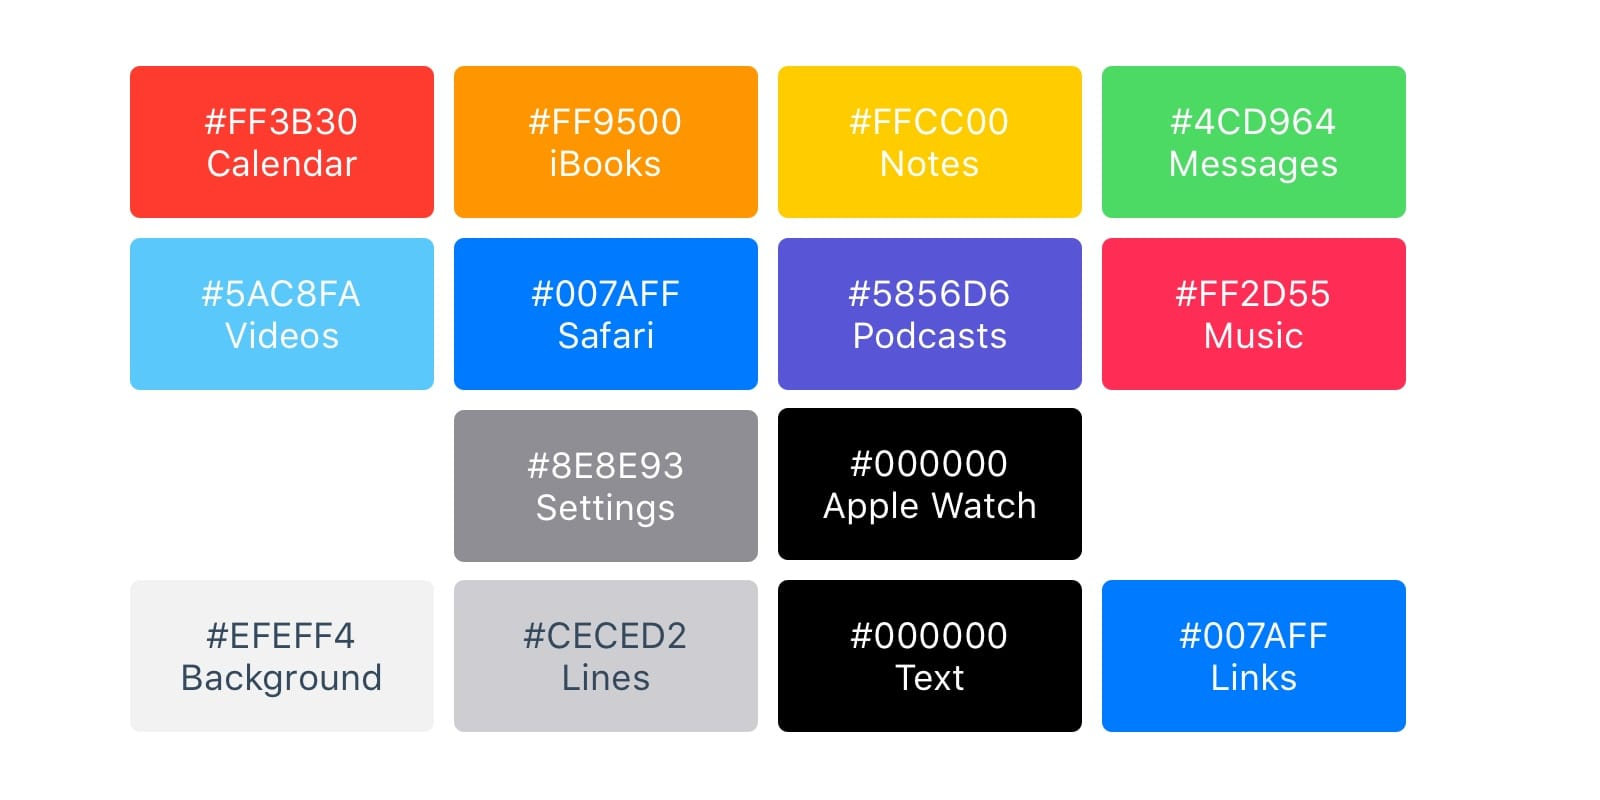 Дизайн под iPhone X. Гайдлайны для iOS 11 - 16